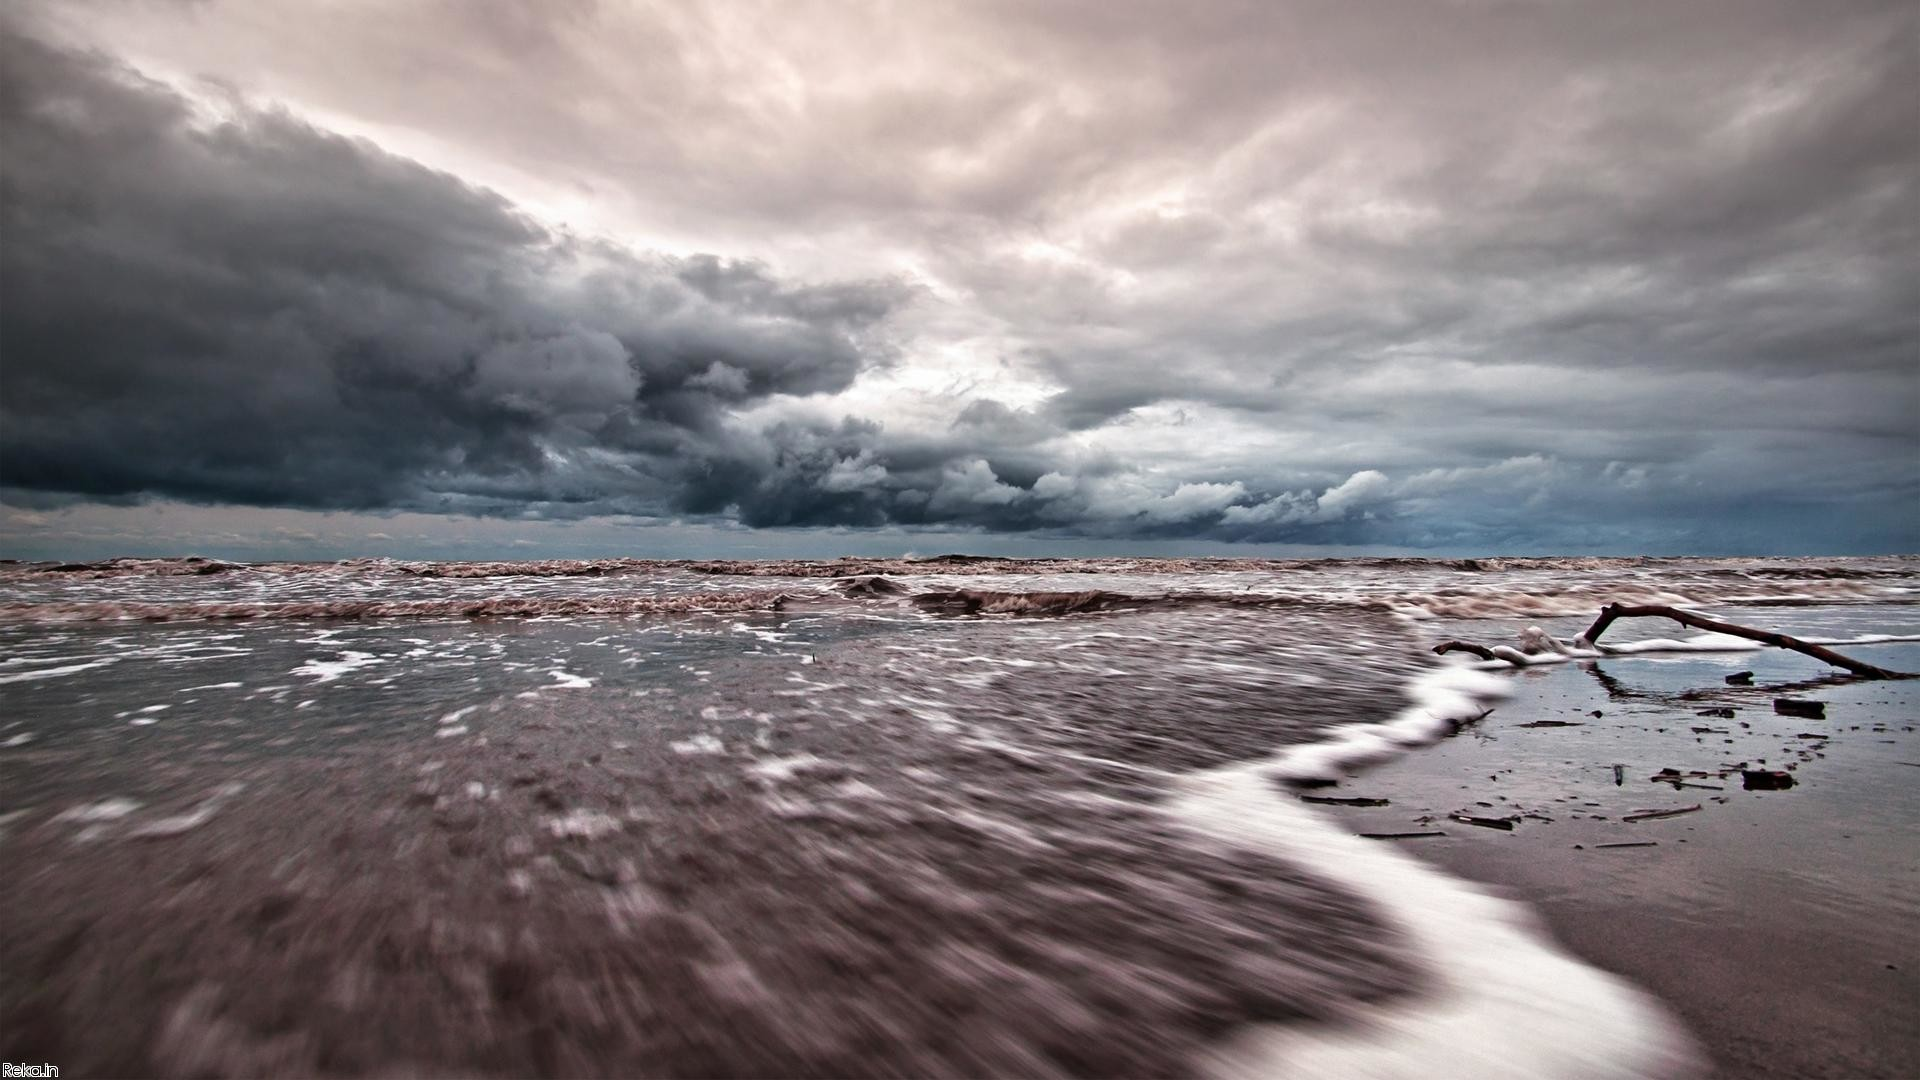 Tide Coming In Under Stormy Skies wallpaper